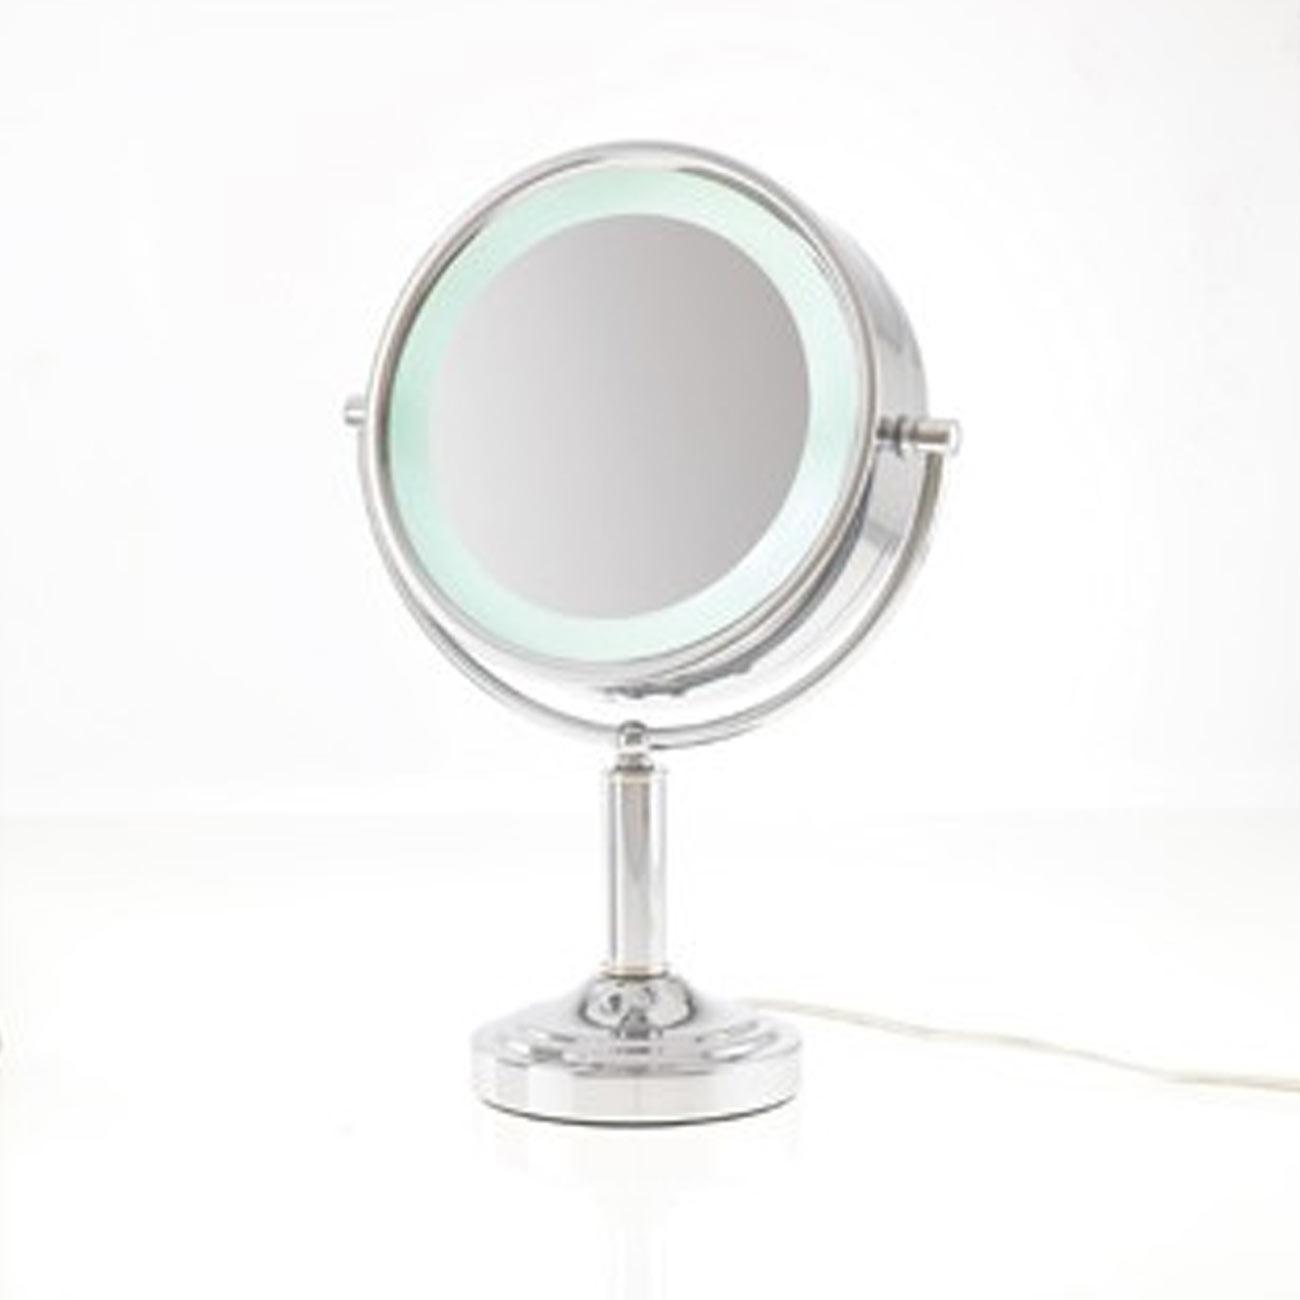 Danielle LED Lit Double Sided Vanity Mirror 15x - Chrome